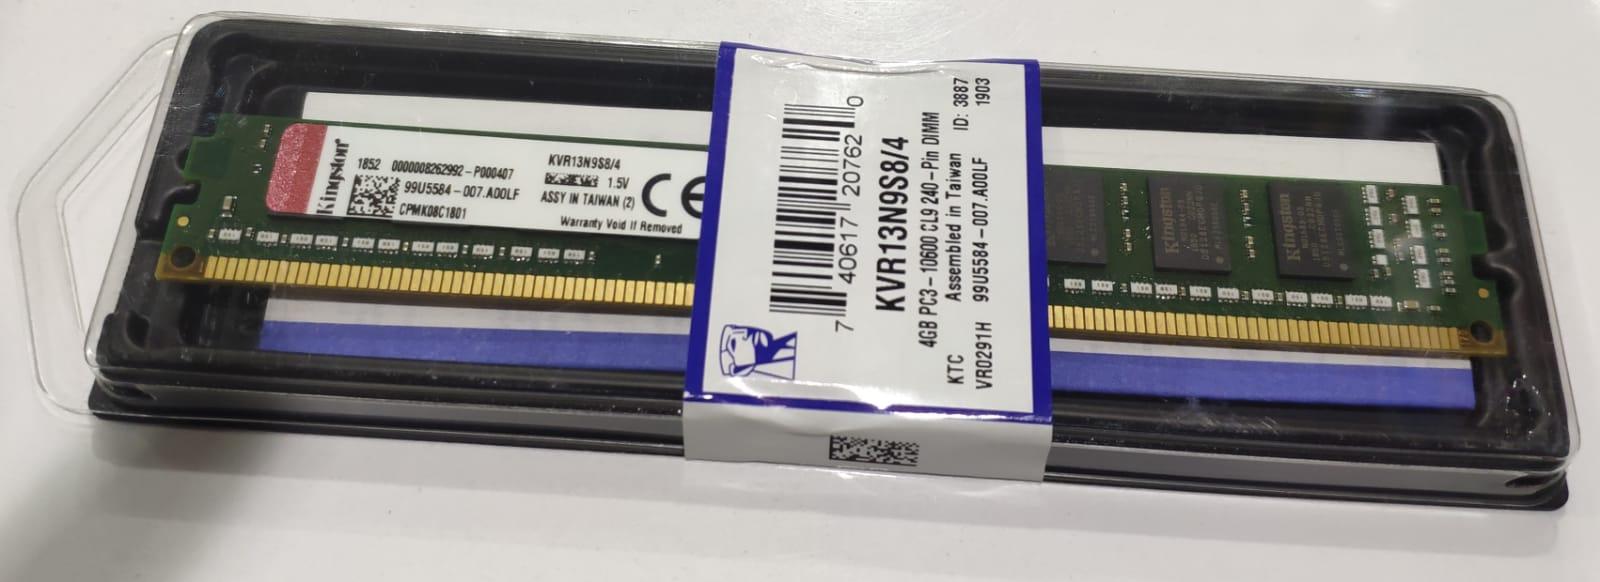 KINGSTON 4GB 1333MHZ DDR3 KVR13N9S8/4 Masaüstü Bilgisayar Bellek